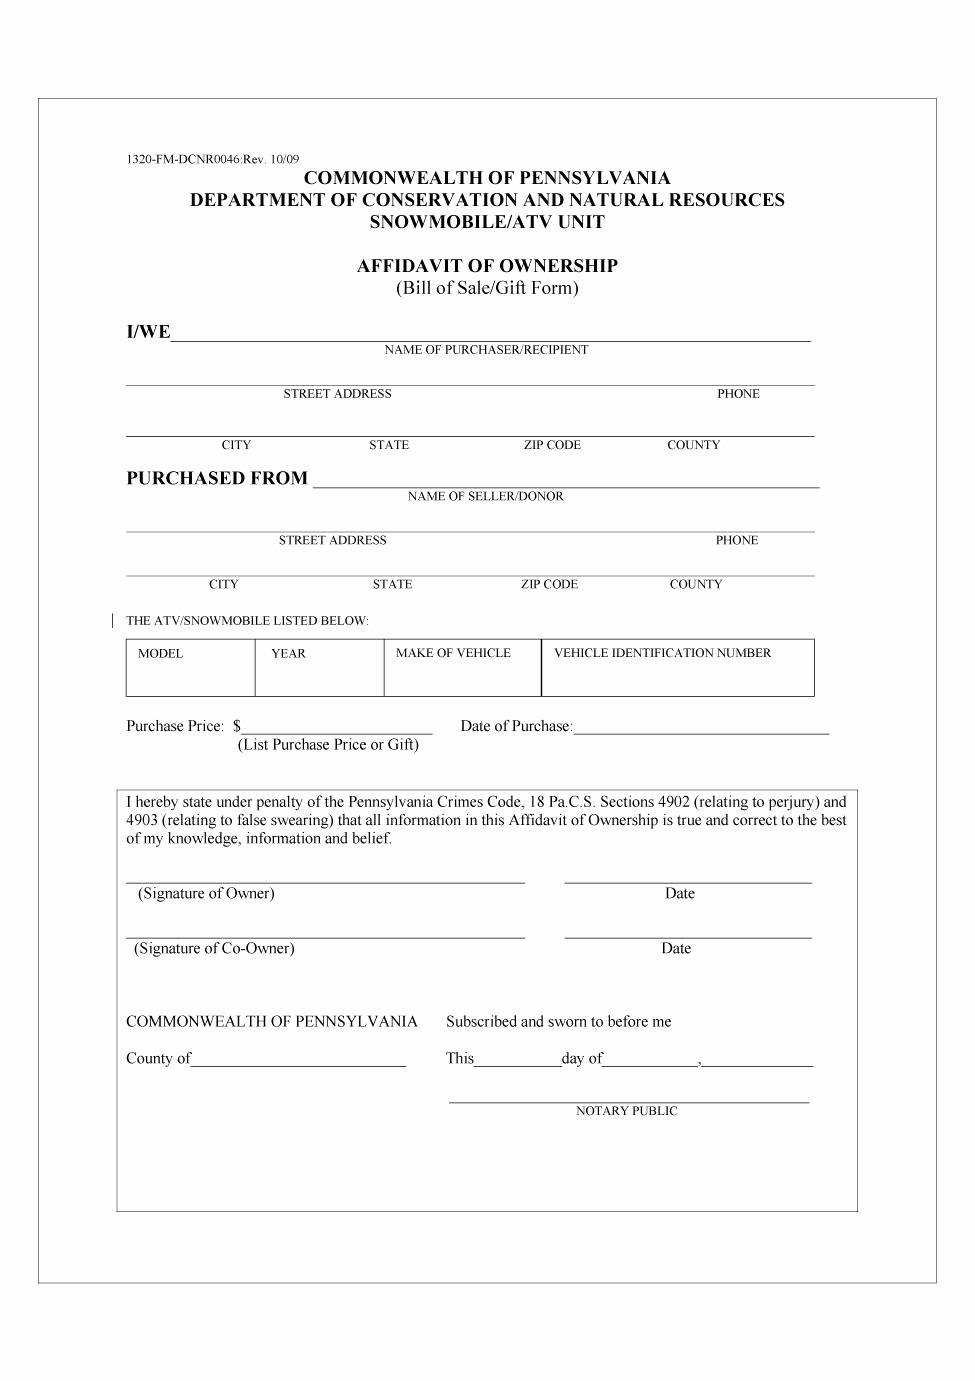 Colorado Auto Bill Of Sale Lovely 45 Fee Printable Bill Of Sale Templates Car Boat Gun